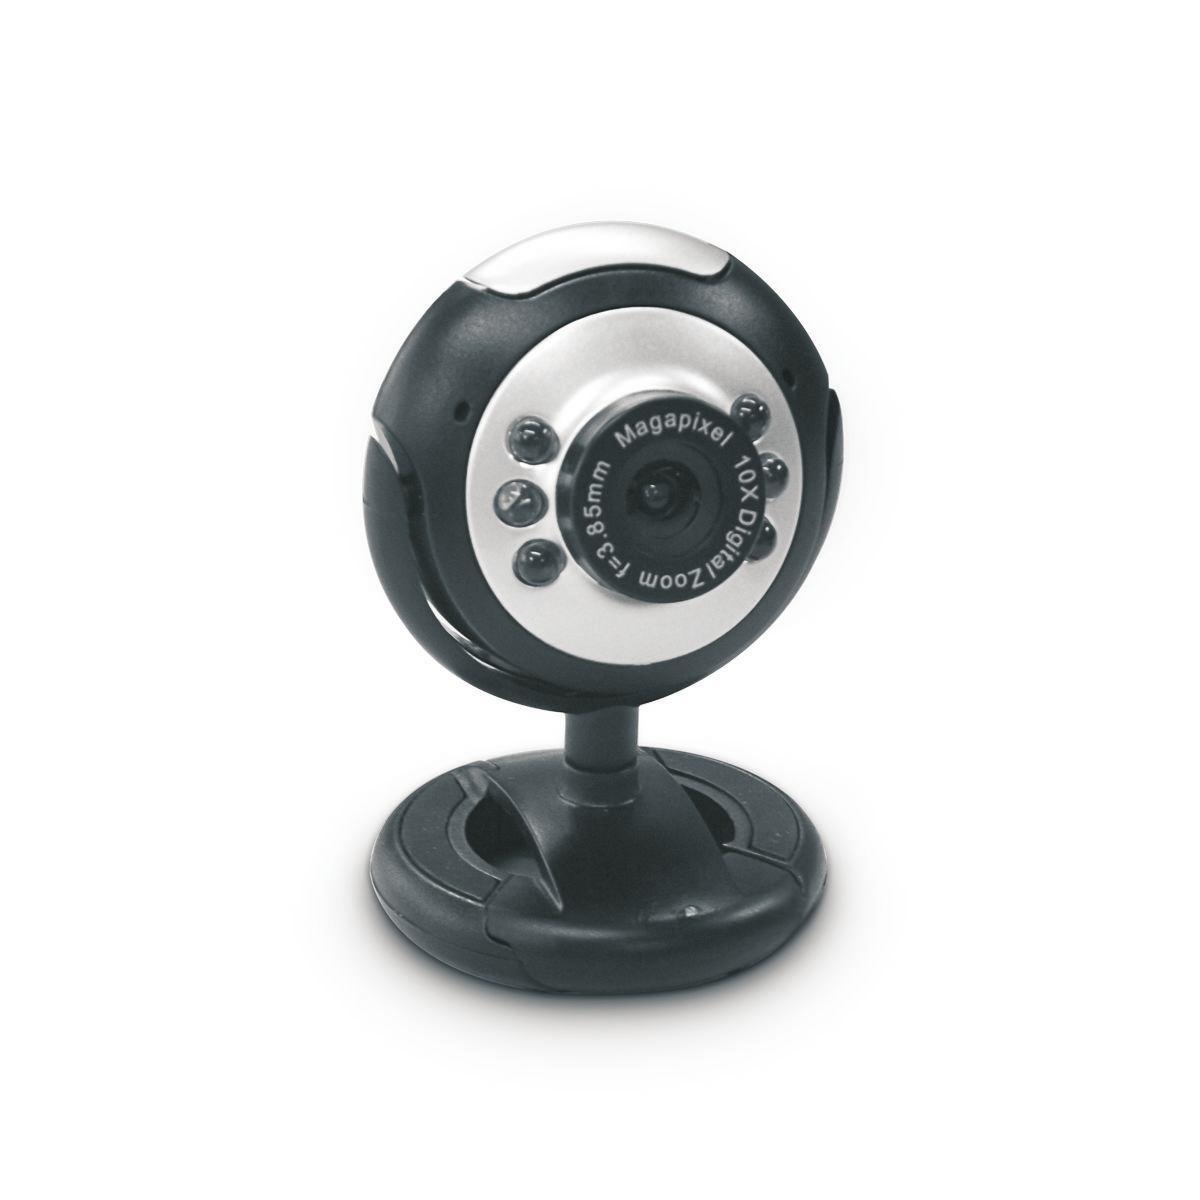 2044259-Dynamode-M-1100M-webcam-2-MP-640-x-480-Pixel-USB-Nero-Argento-Dynamode